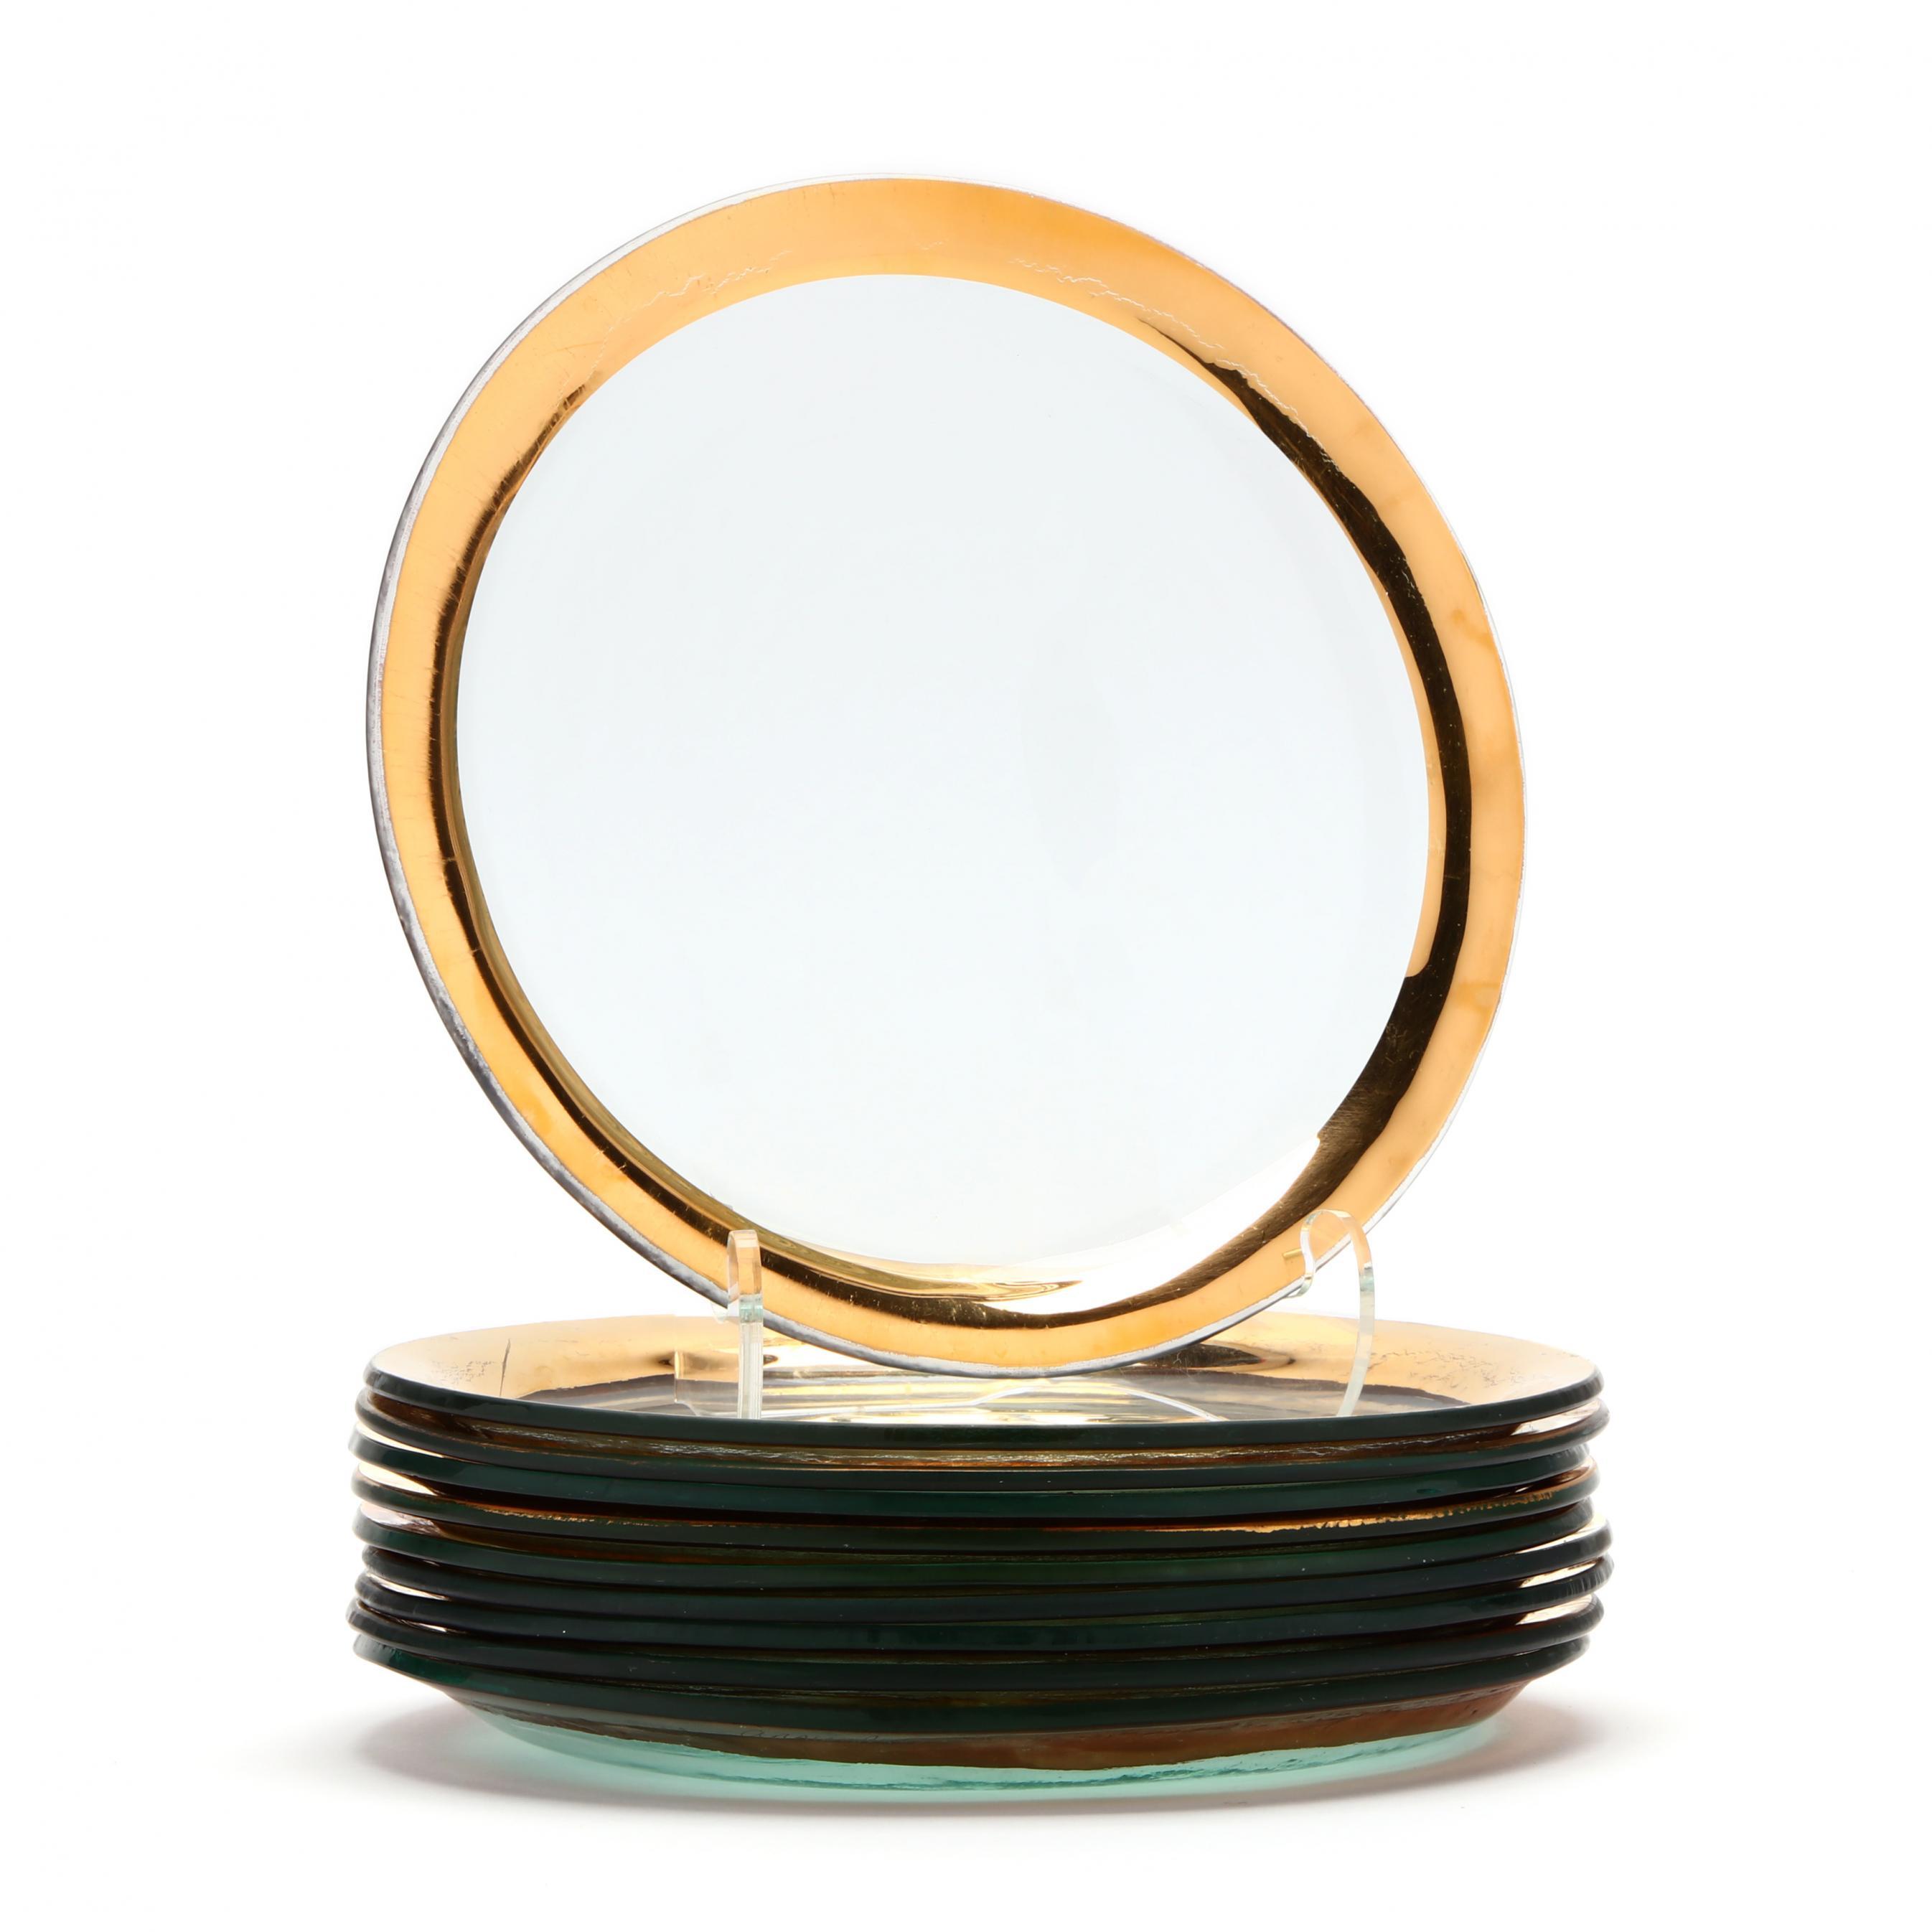 annie-glass-ca-set-of-ten-gilt-glass-plates